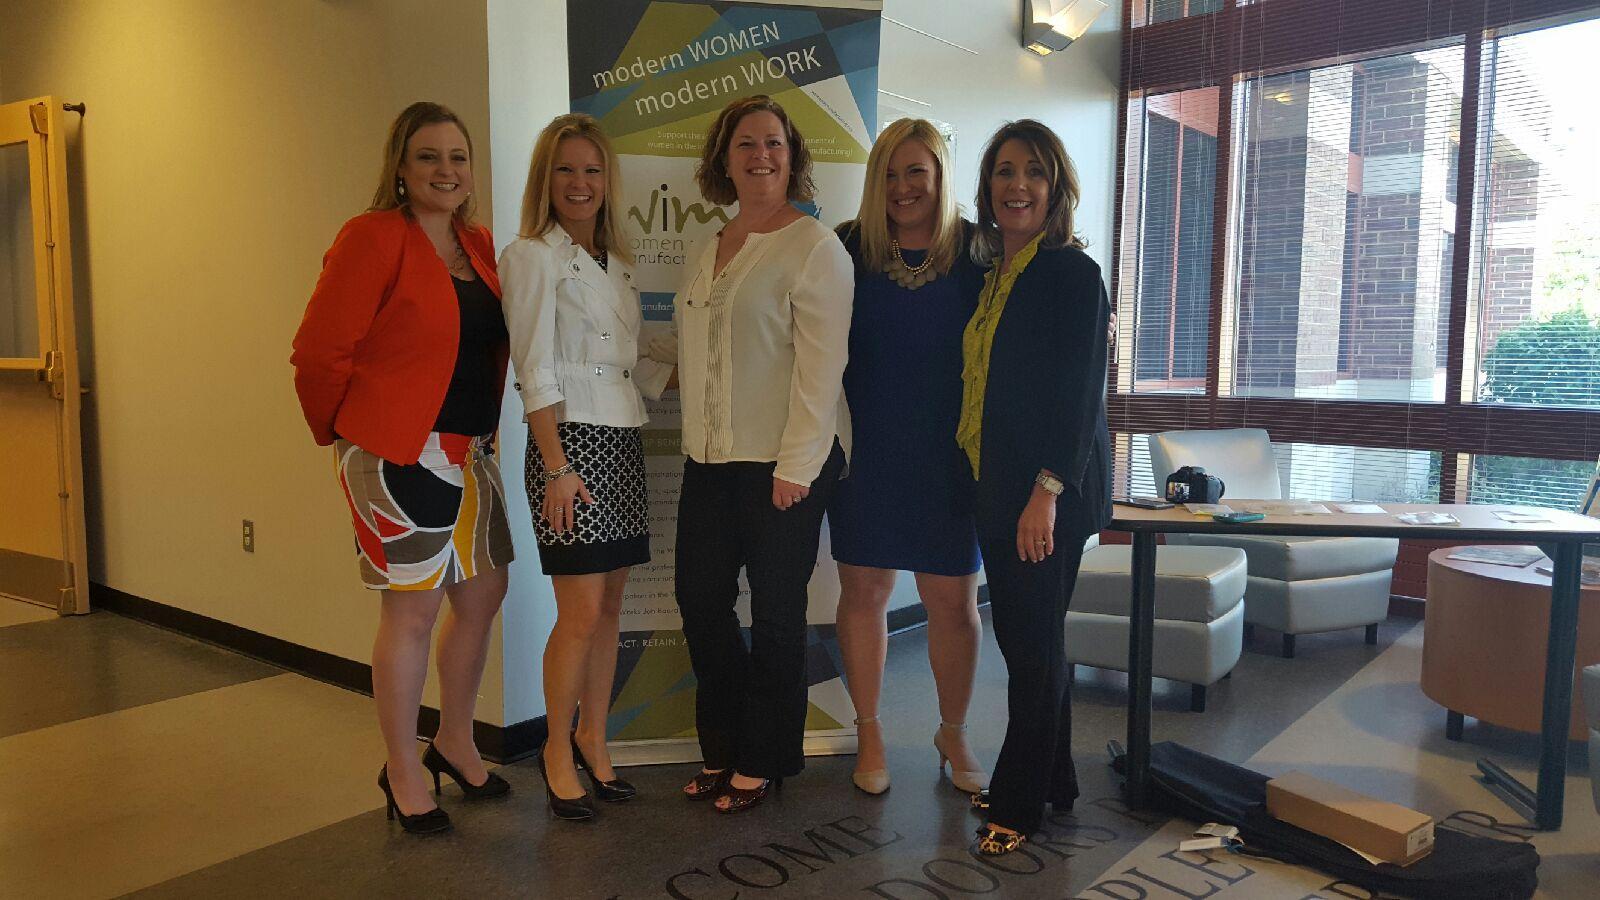 Natalie Walters, Waukesha State Bank; Teresa Schell, Vive; Antonia Stone, Busch Precision; Linda Malwitz, Vive; April Schultz, EFCO Finishing